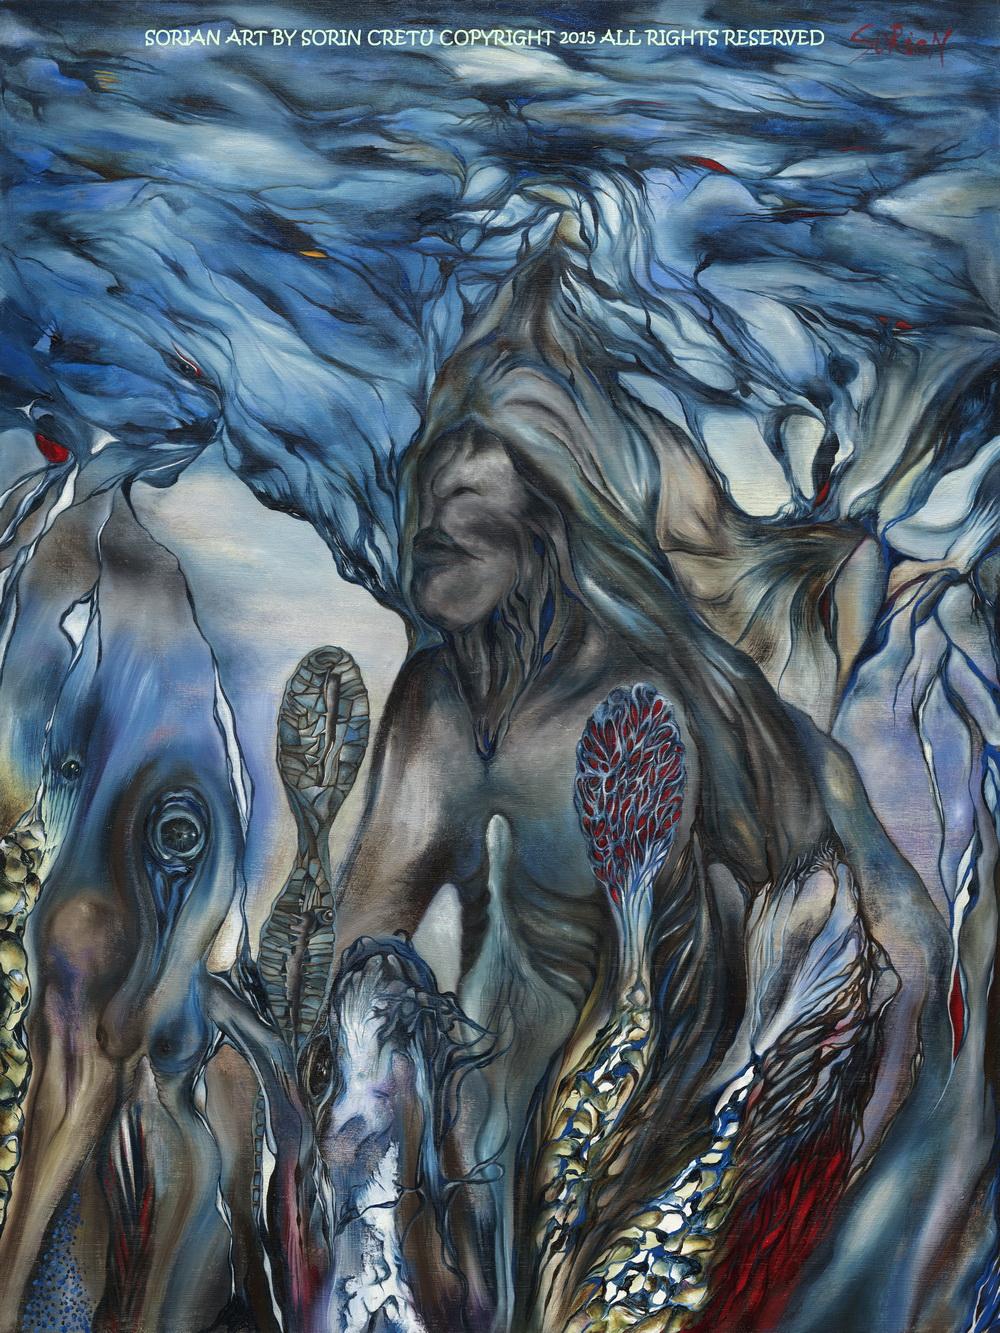 Visions of a shaman1 - SORiaN (Sorin Cretu) - 2016 - Size 40x30inch - very small.jpg